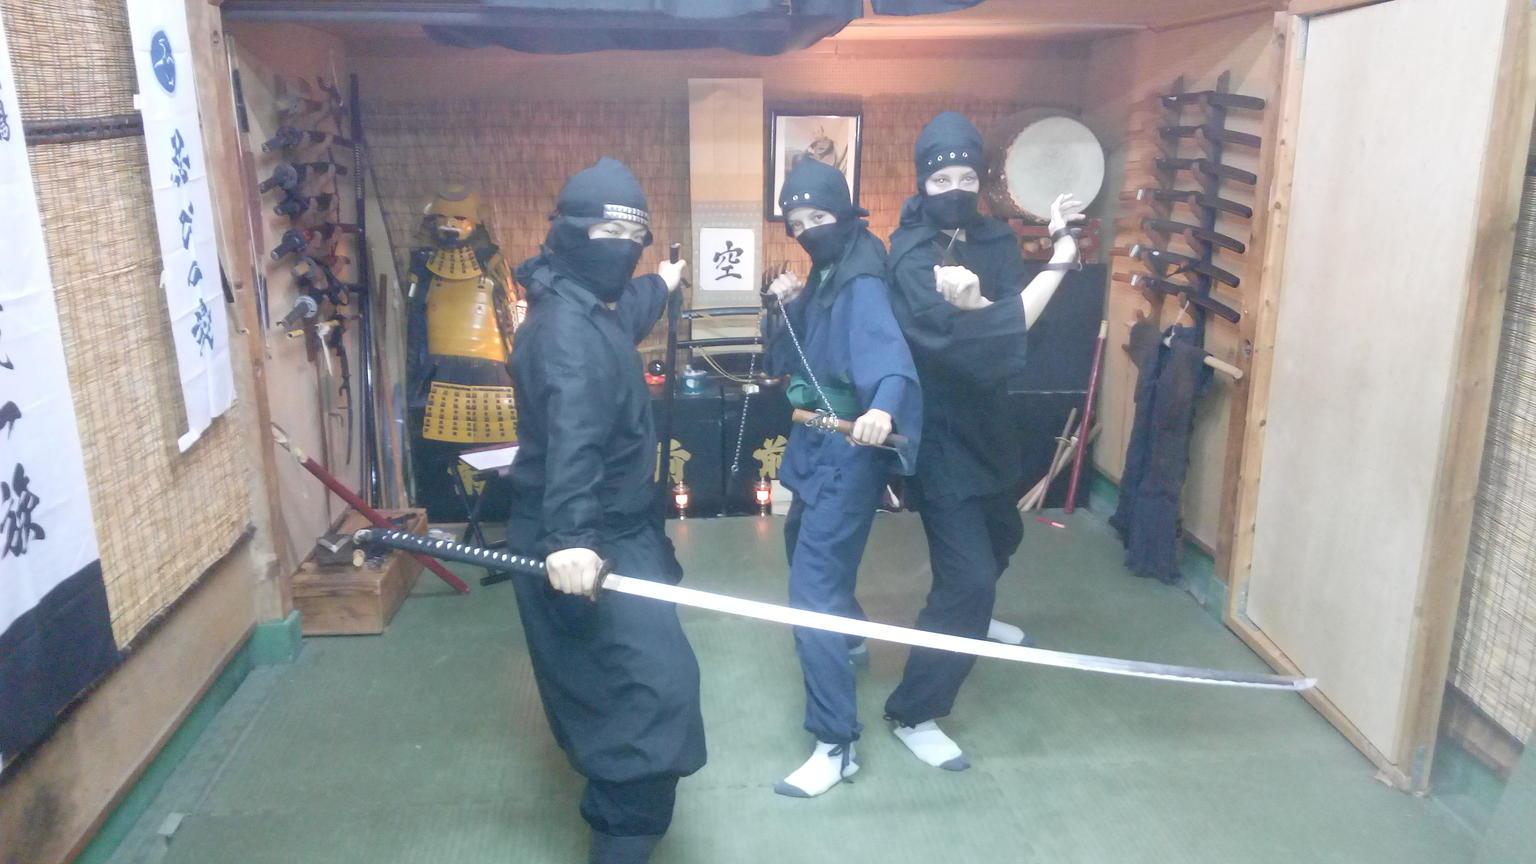 MÁS FOTOS, Private 90-Min. Elite Ninja or Samurai Experience: Stealth Walk, Shuriken, Sword